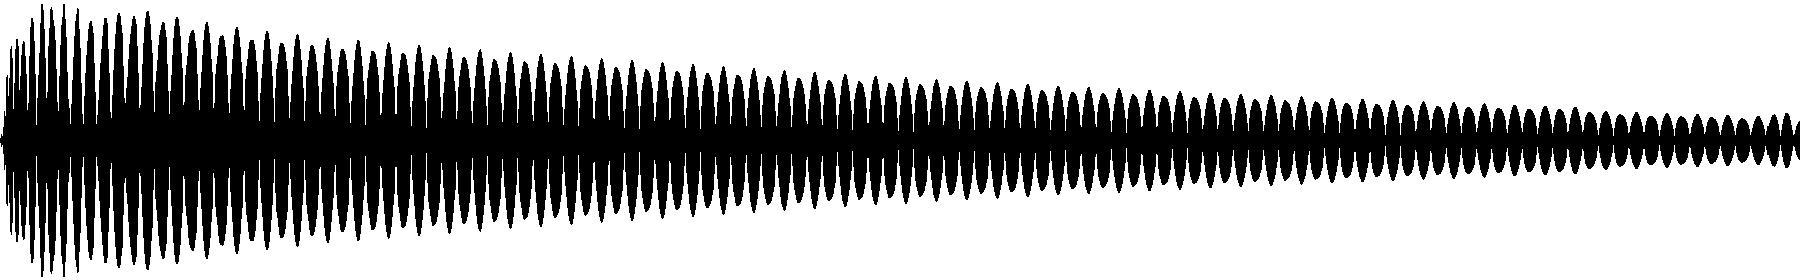 808 1